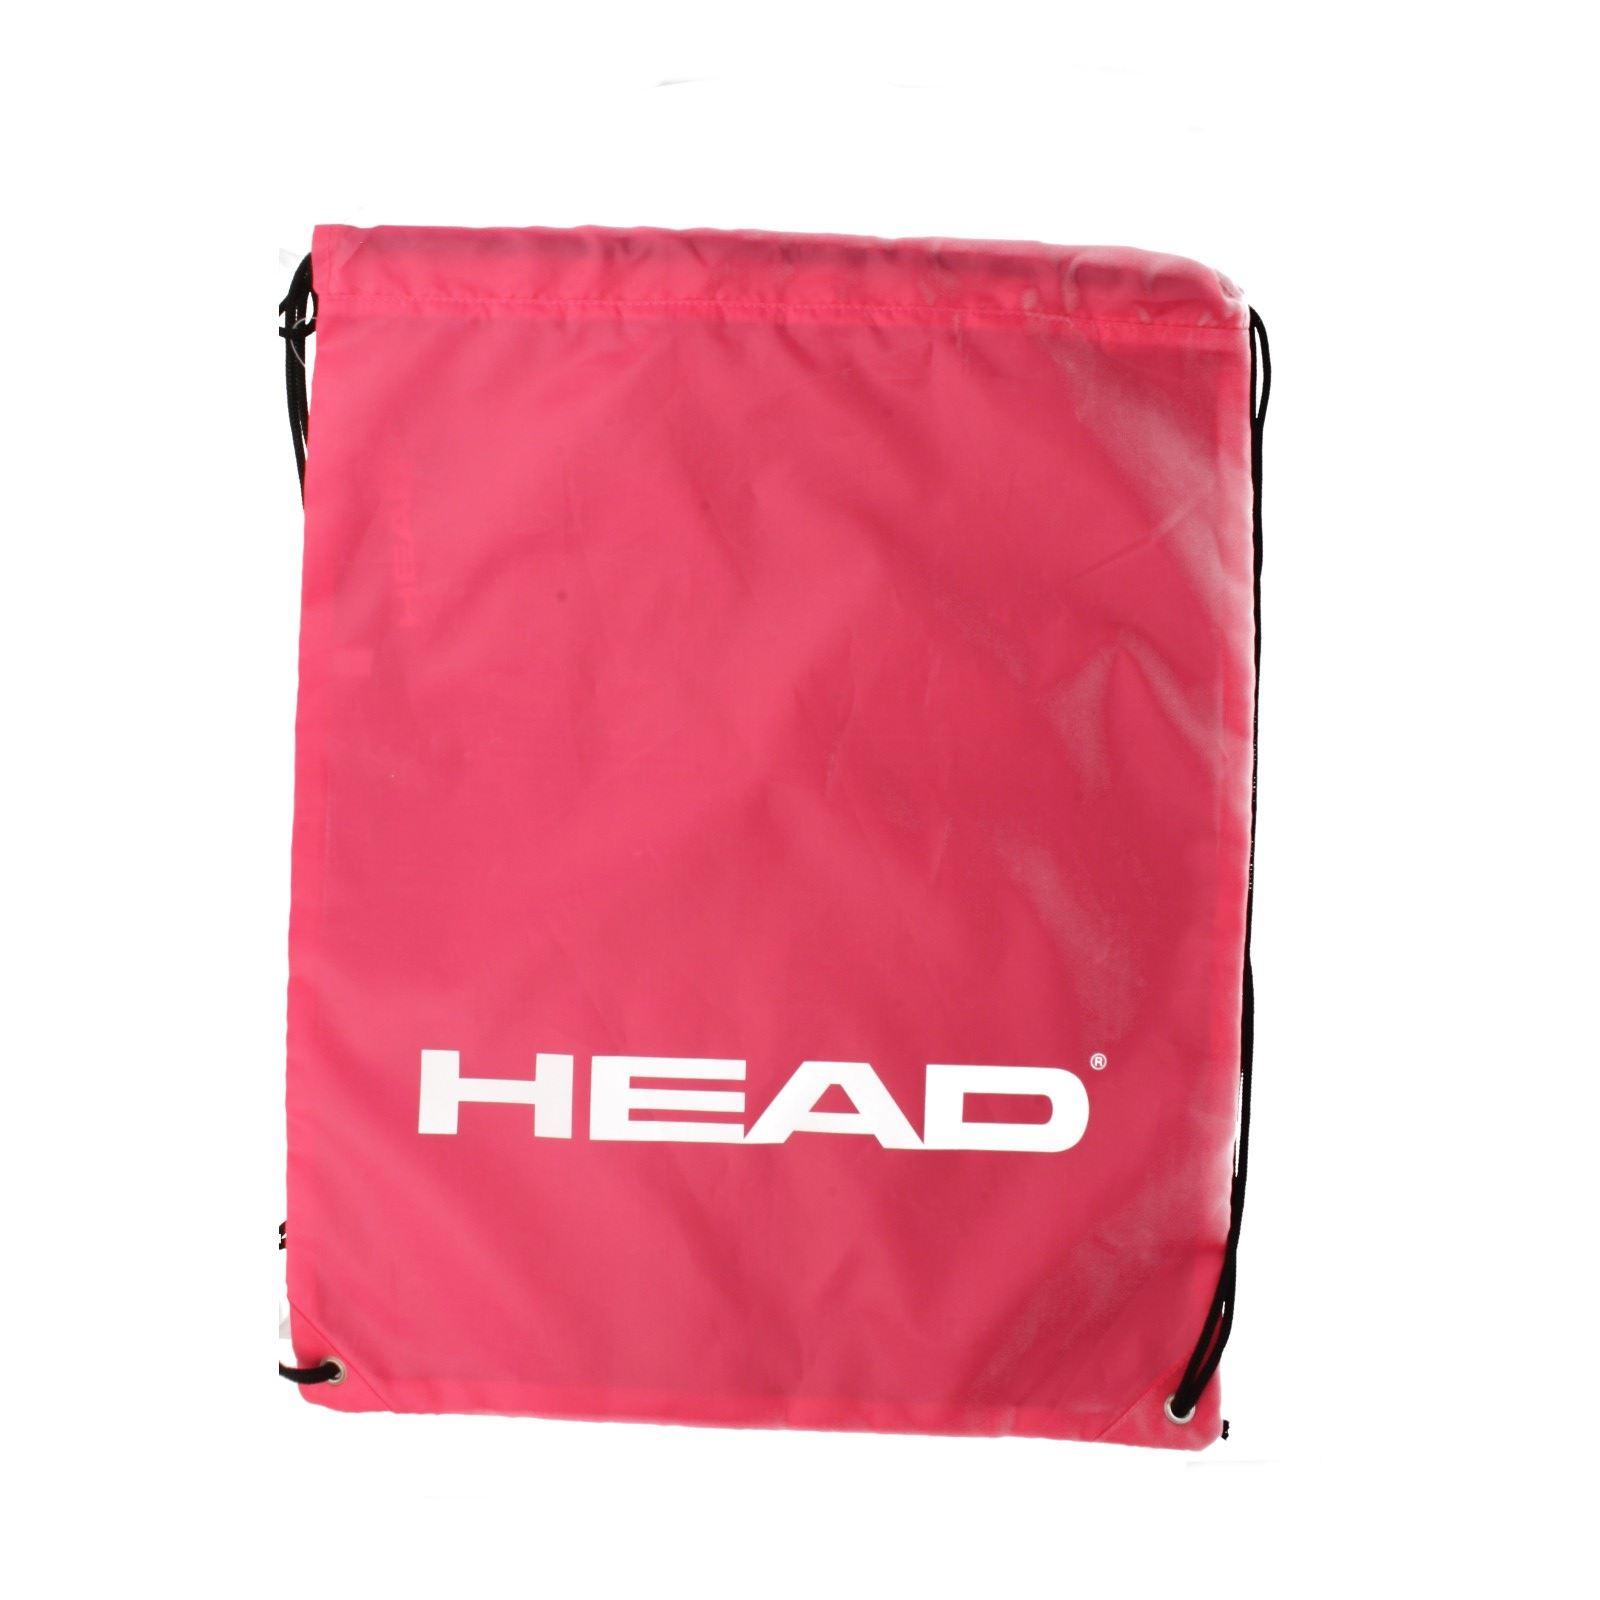 Unisex Head - Drawstring Bags 901011